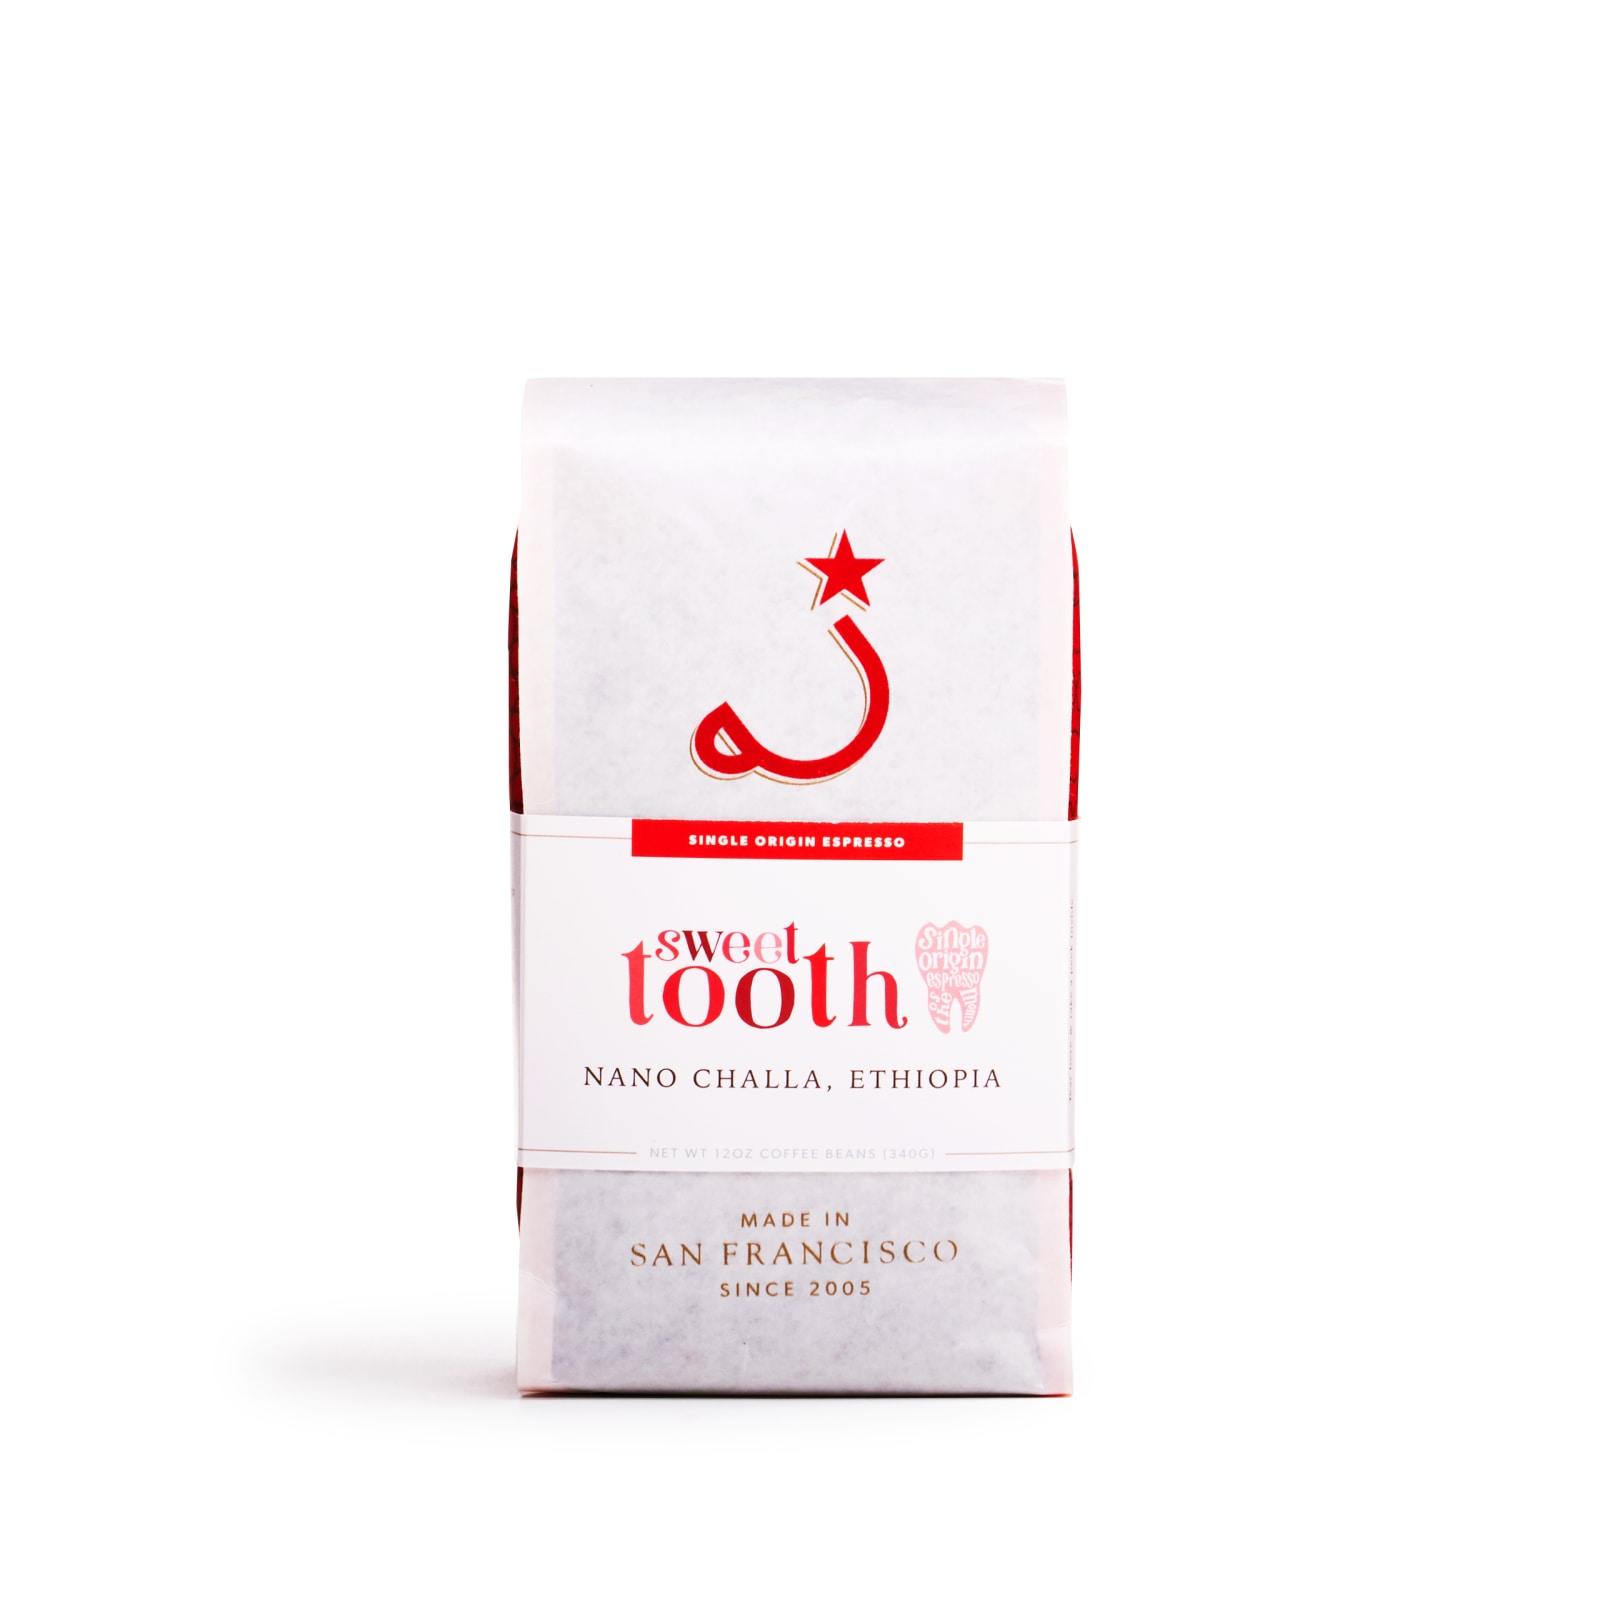 Sweet Tooth Nano Challa, Ethiopia